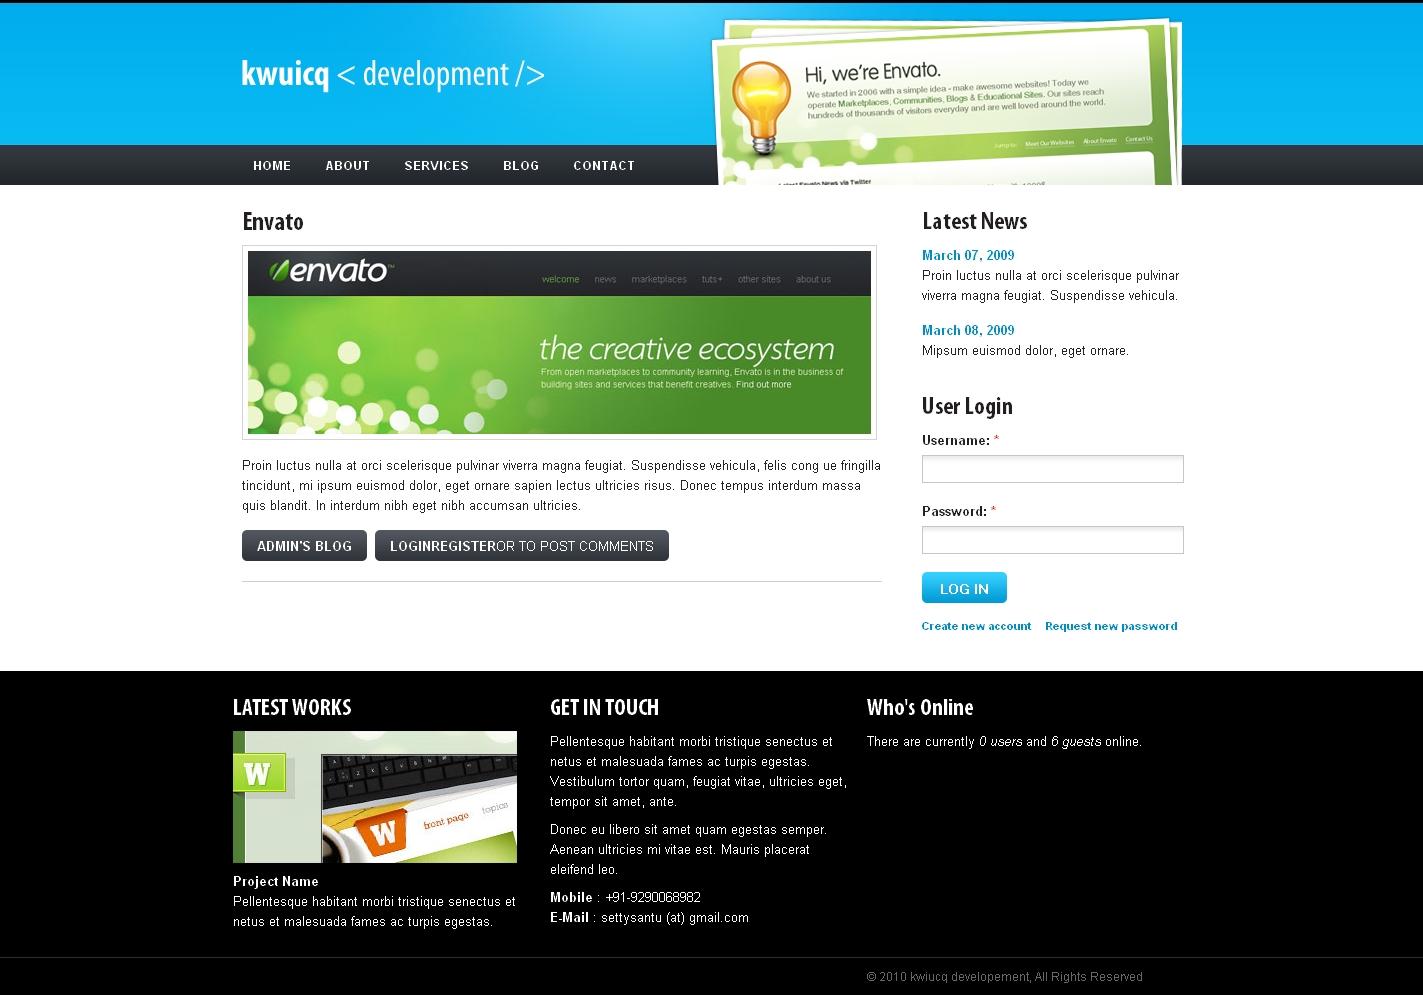 Kwuicq Drupal 6 Corporate Blue Theme by settysantu